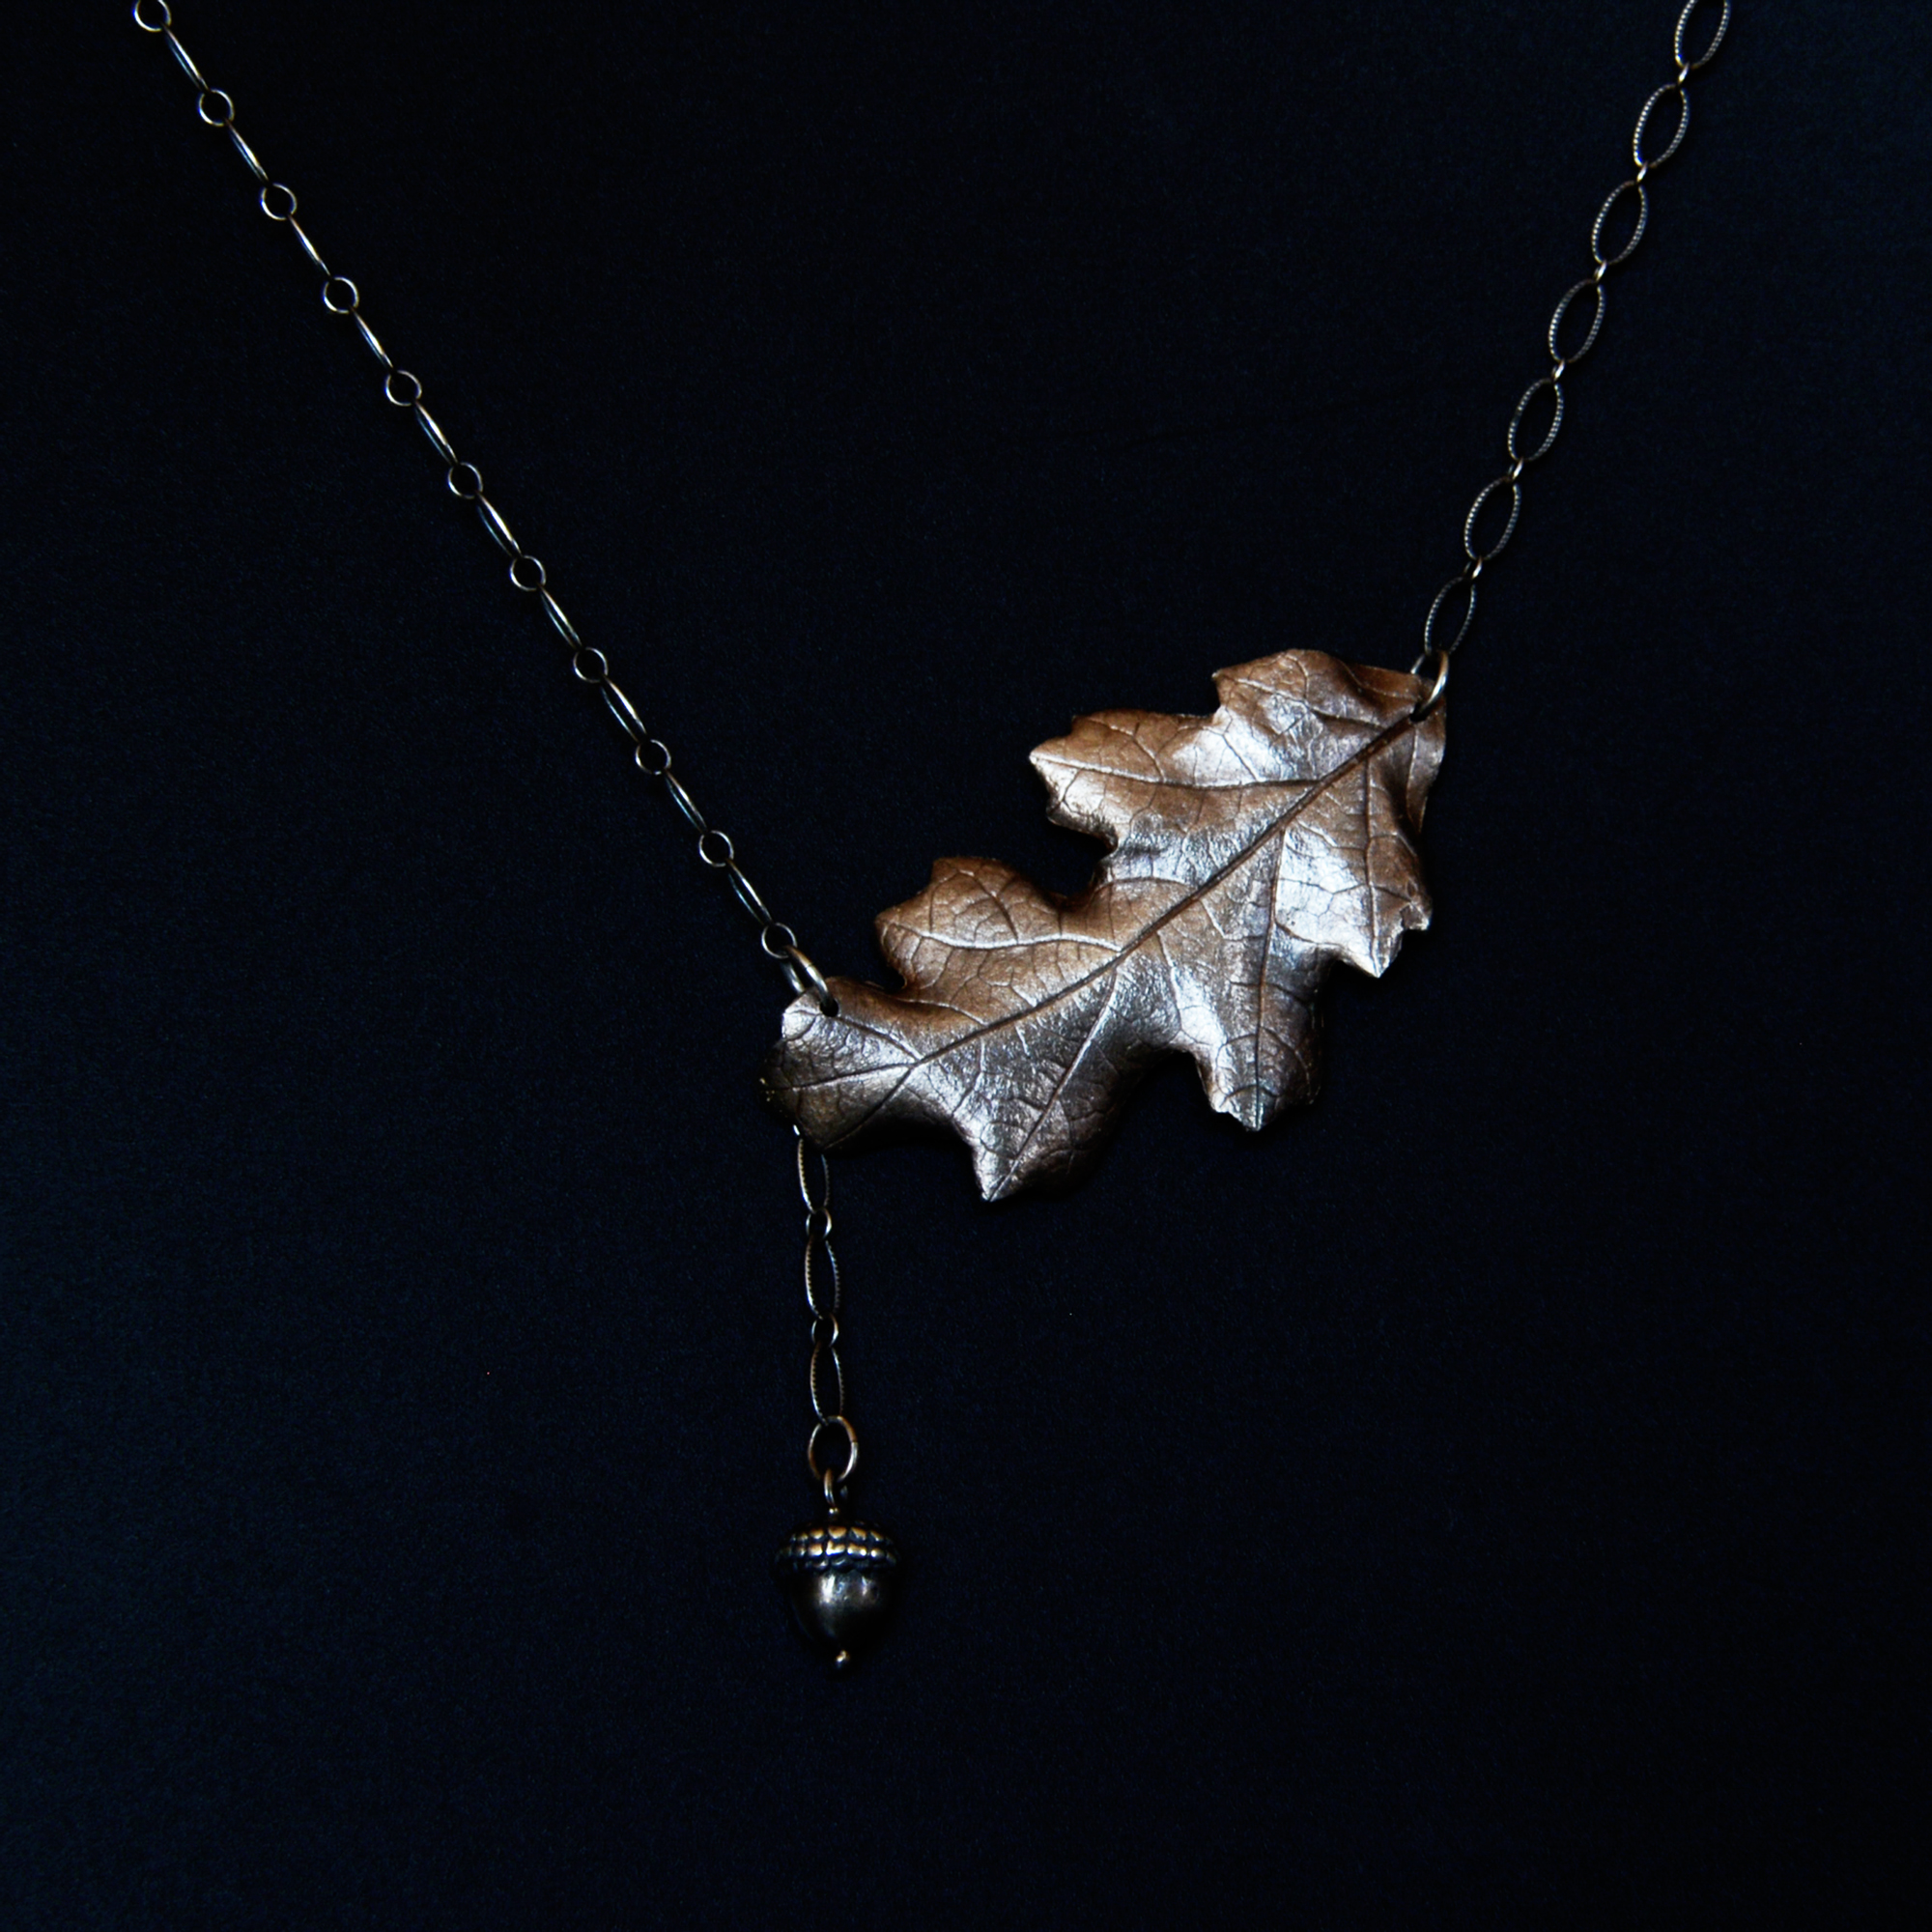 autumn-oak-necklace-michelle-hoting-web.jpg